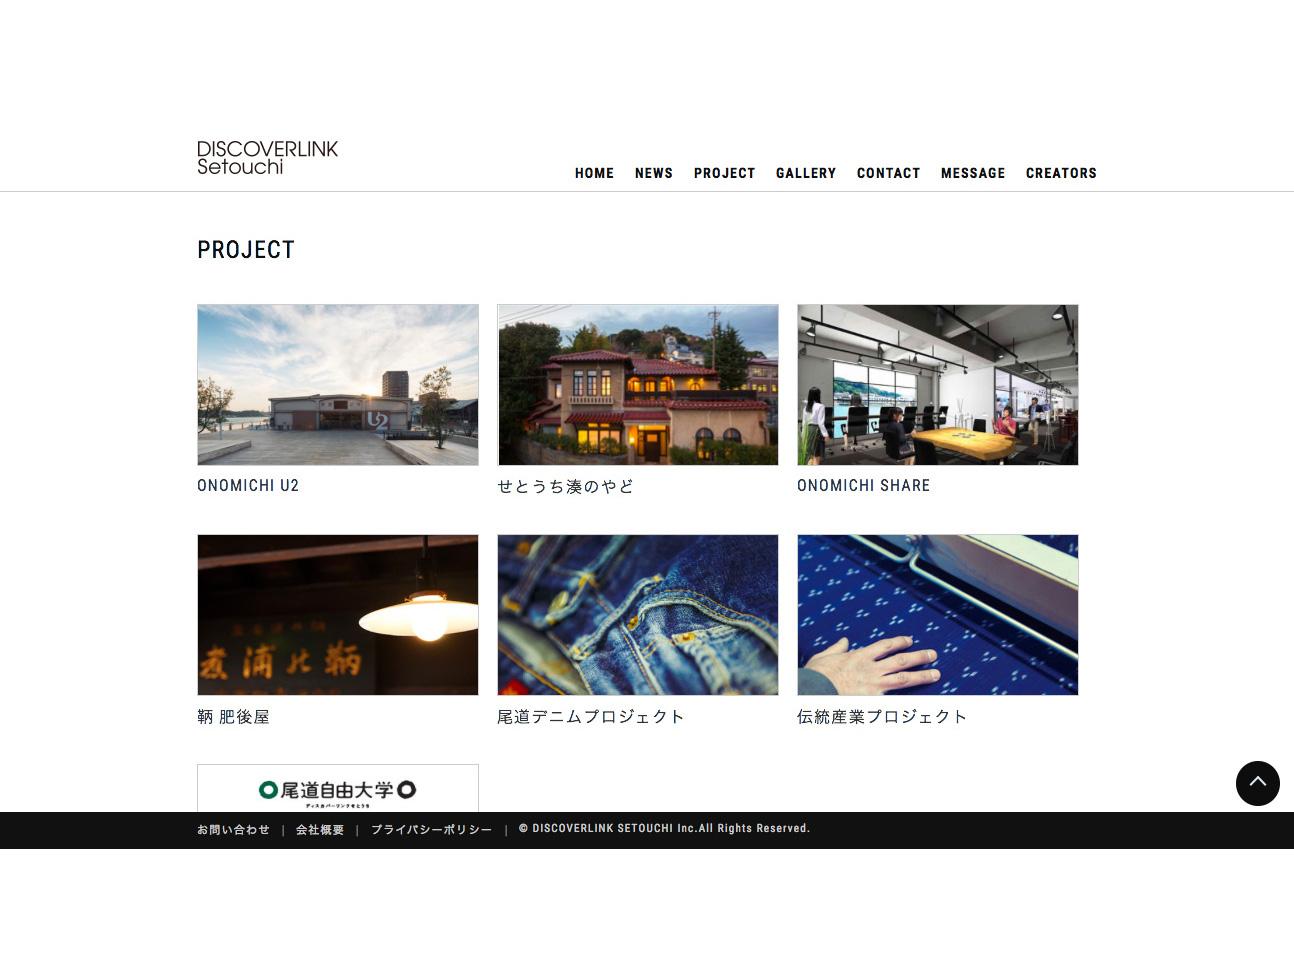 discoverlink_3*.jpg